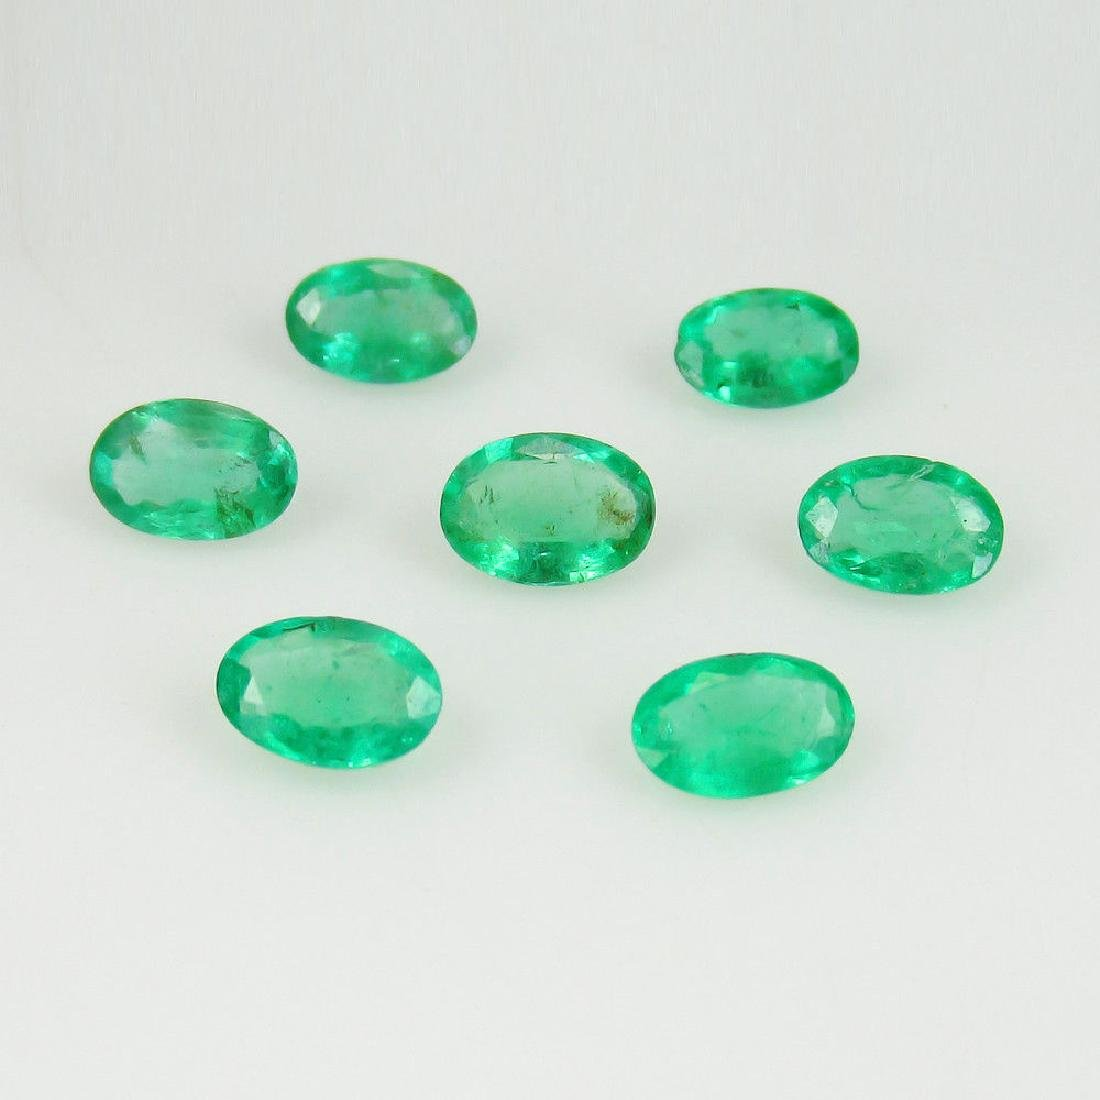 2.84 Ct Genuine Zambian Emerald Matching Oval Necklace